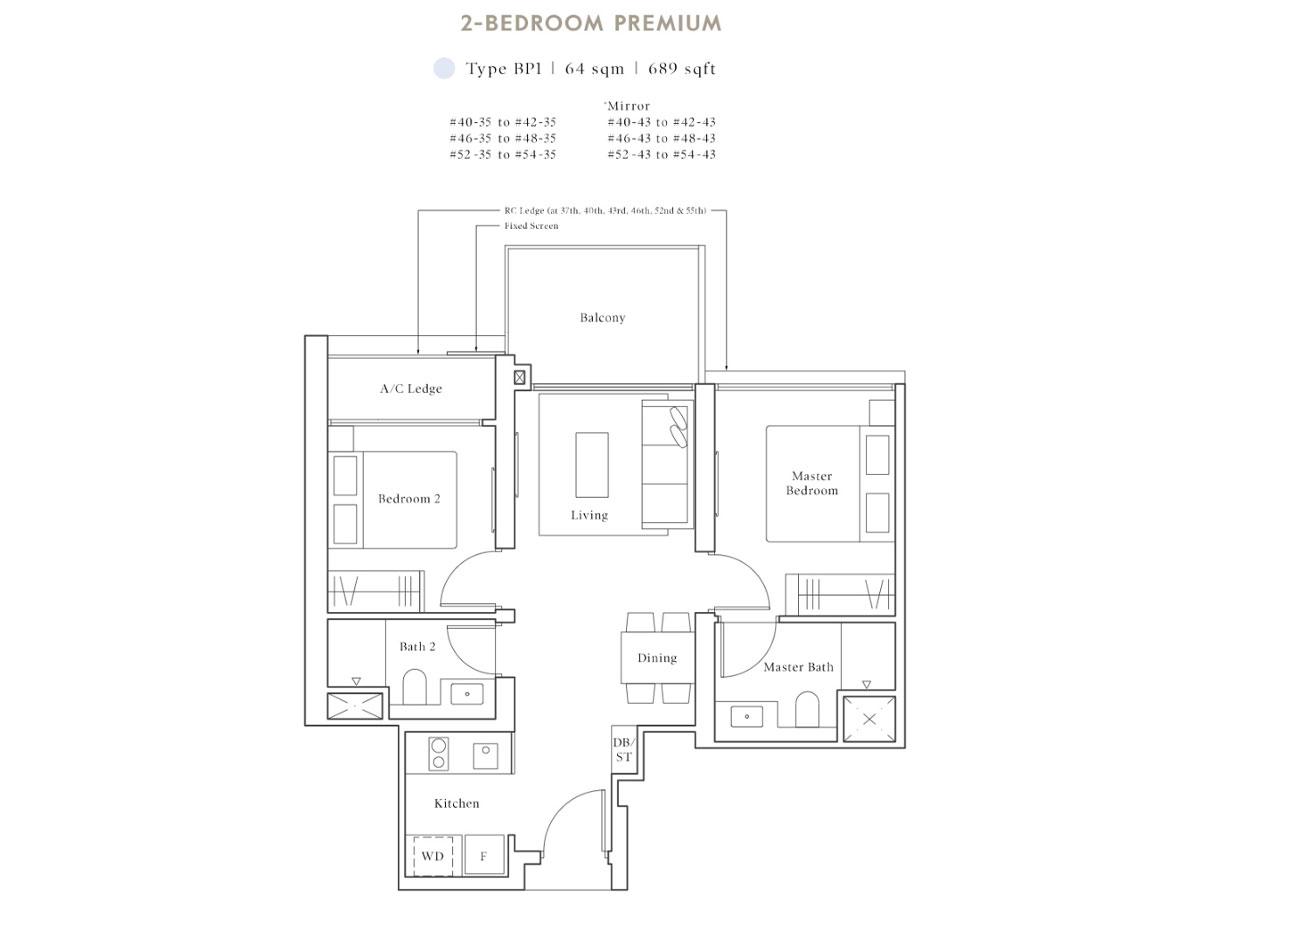 Peak Collection - 2 Bedroom Premium, BP1